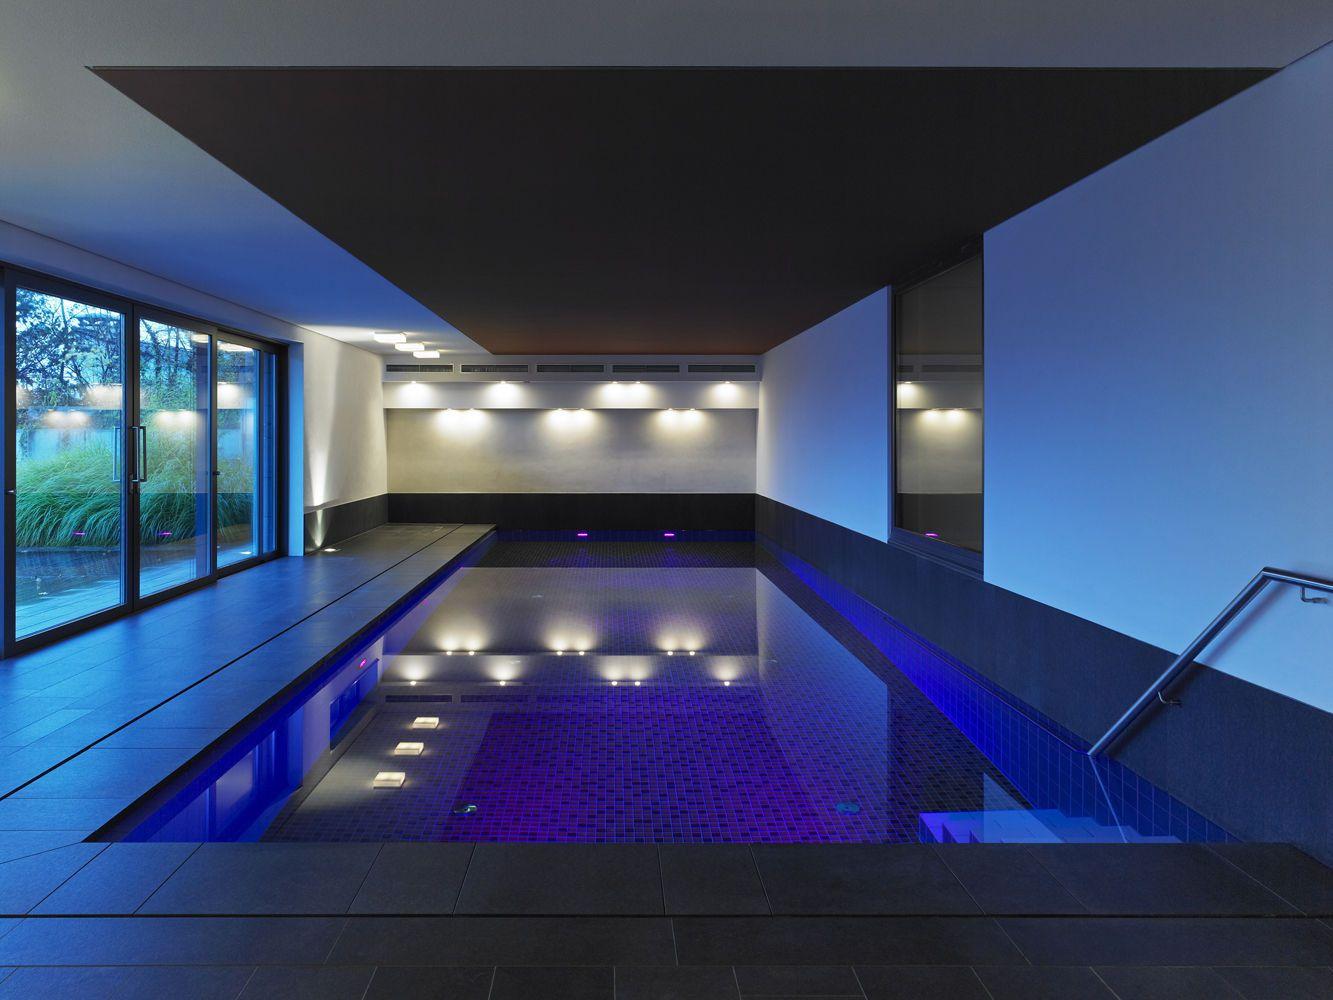 schwimmbadtechnik erschwingliche swimmingpools. Black Bedroom Furniture Sets. Home Design Ideas